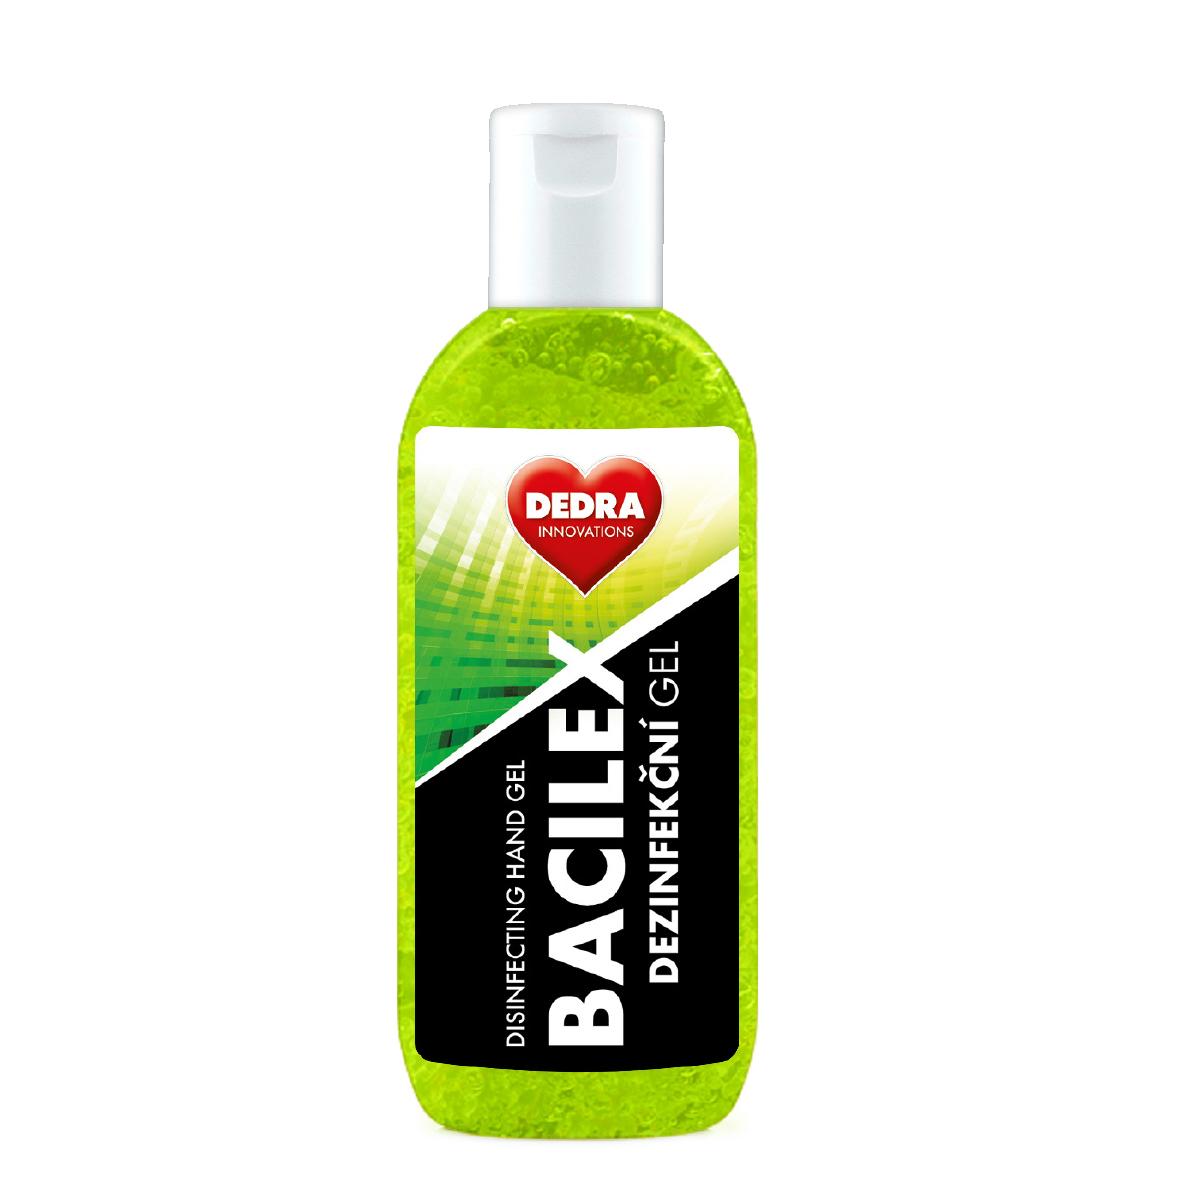 Certifikovaný dezinfekční gel na ruce, 70 % alkoholu, BACILEX DISINFECTING HAND GEL